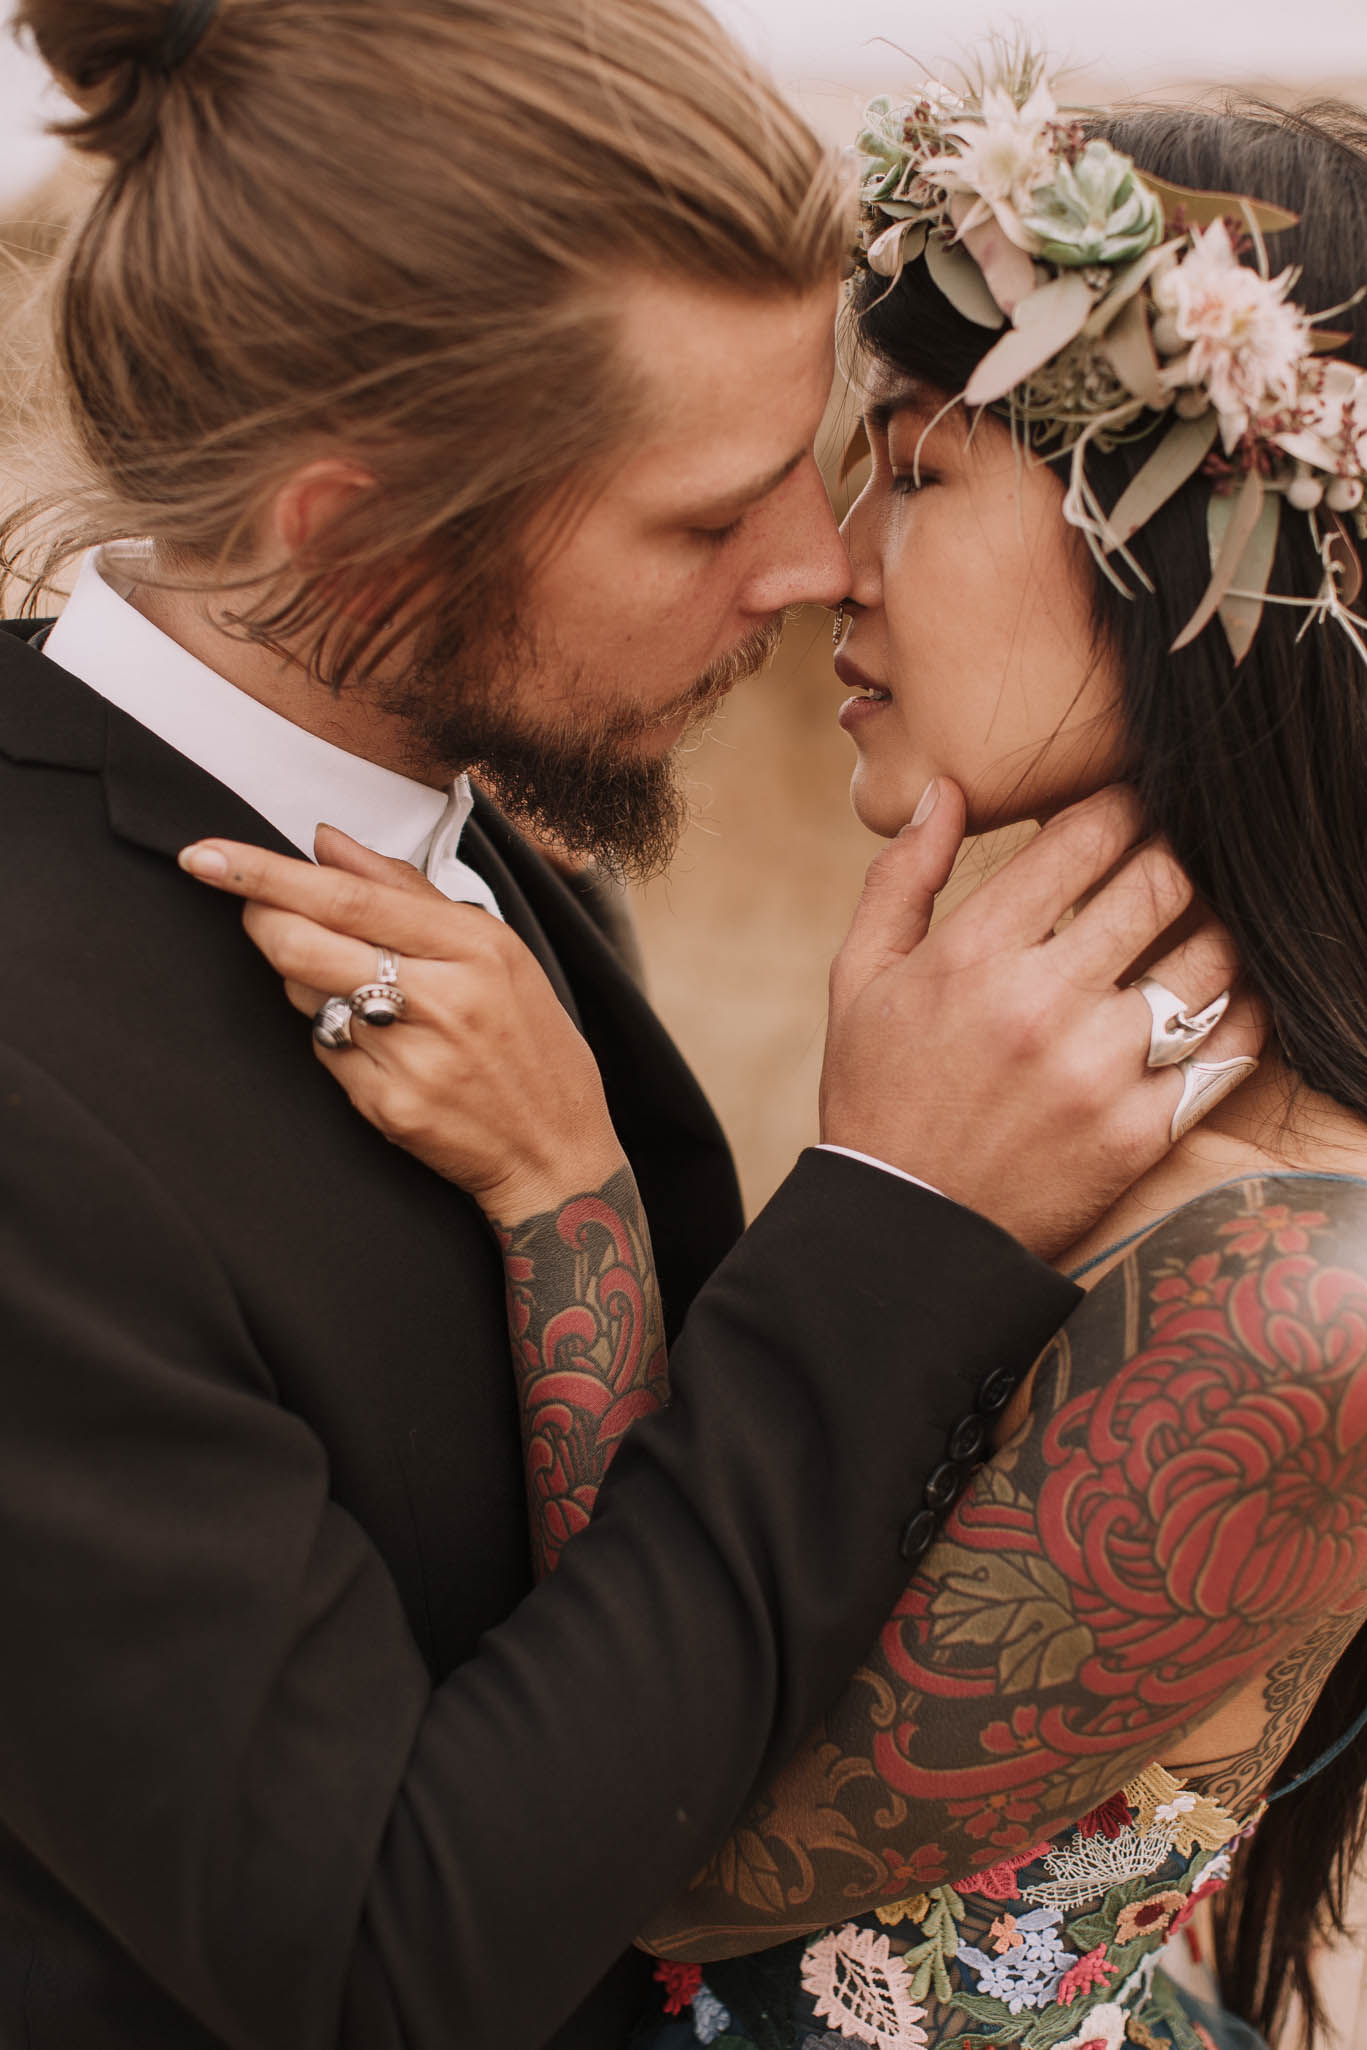 Spain-wedding-photographer-bardenas-reales-jeremy-boyer-photographe-mariage-bordeaux-floral-wedding-dress-robe-122.jpg